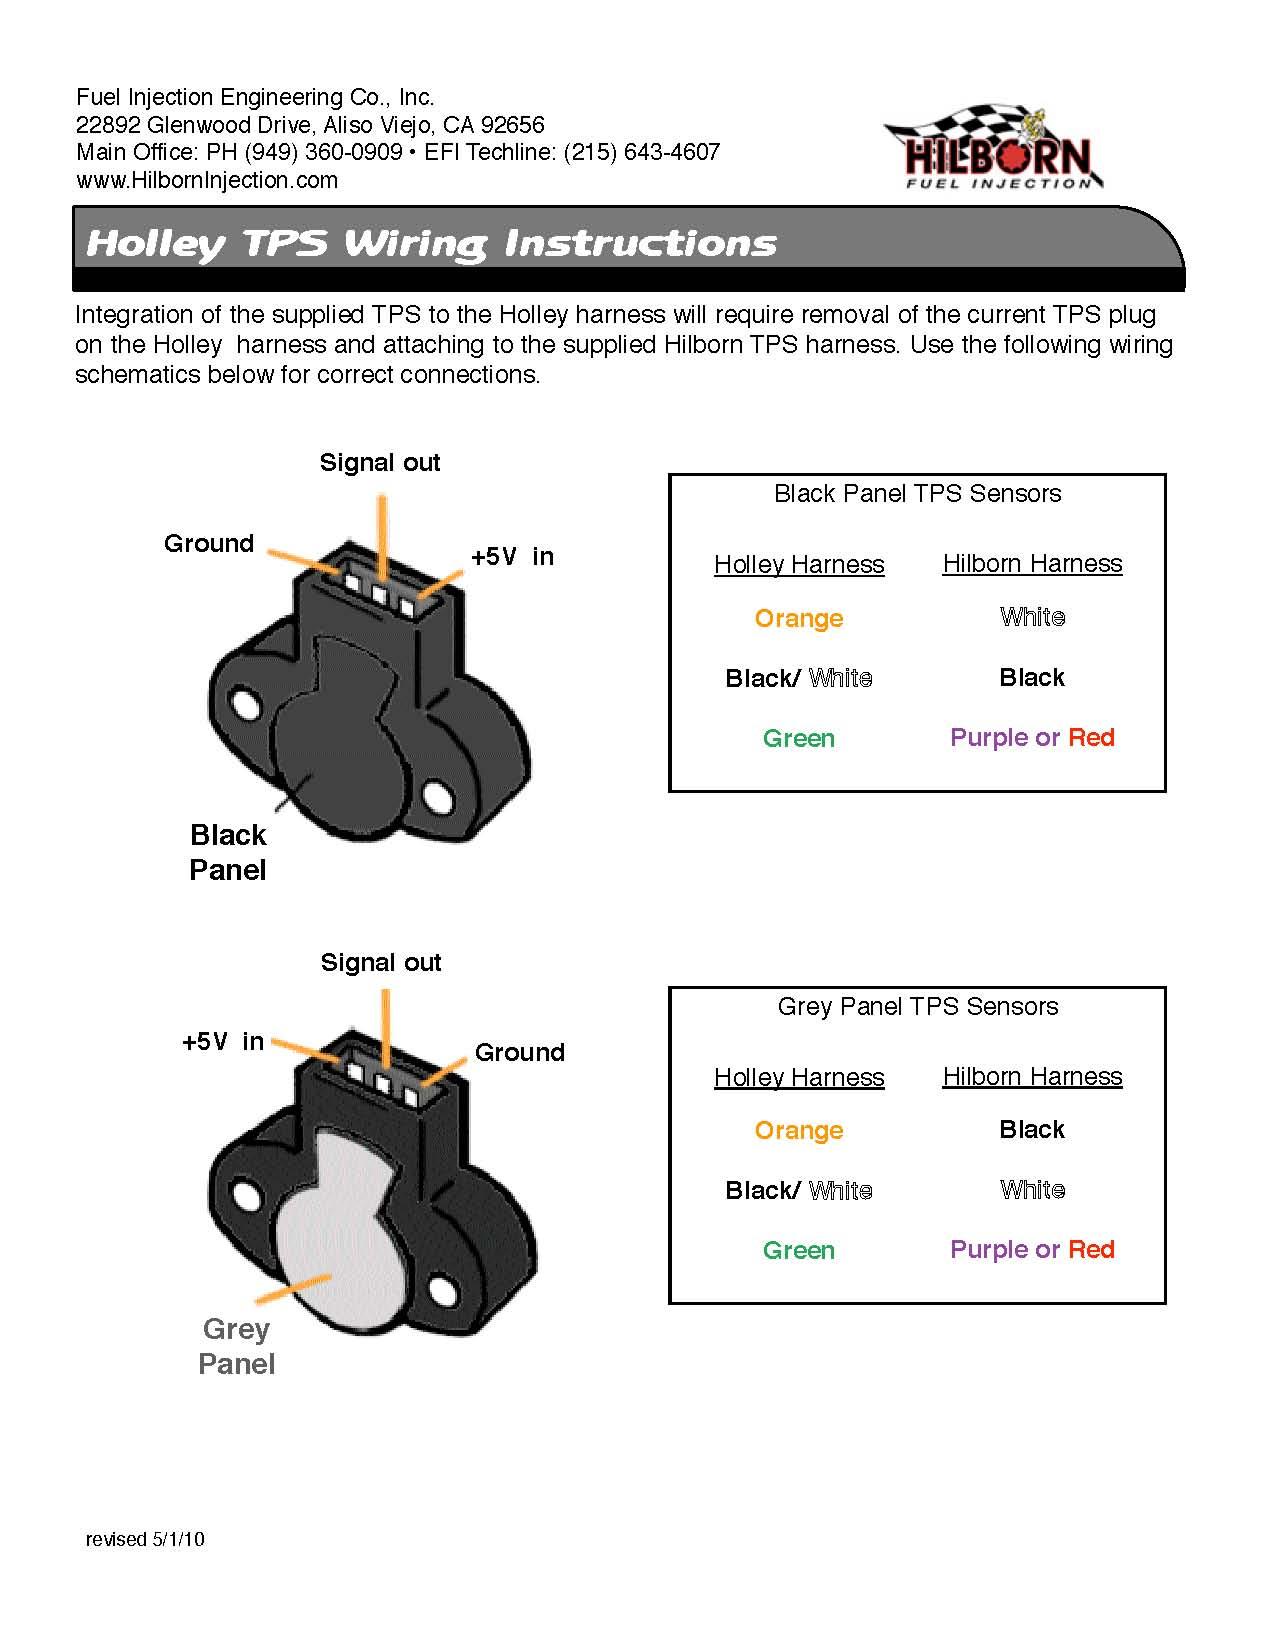 Hh 1529  Throttle Position Sensor Wiring Diagram